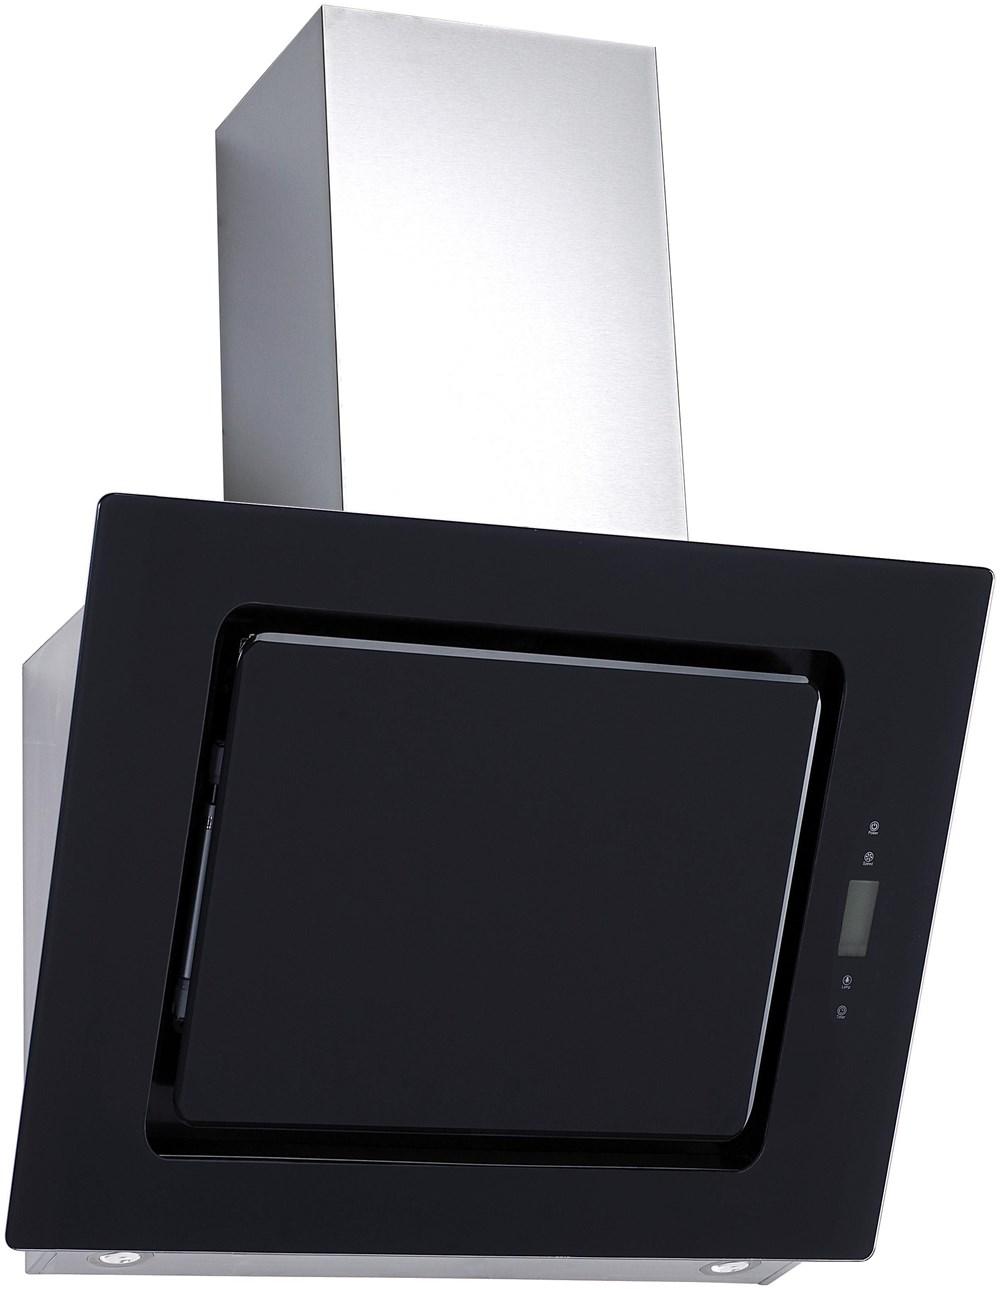 respekta CH 9040/60 Glasschirmhaube schwarz (EEK: C)